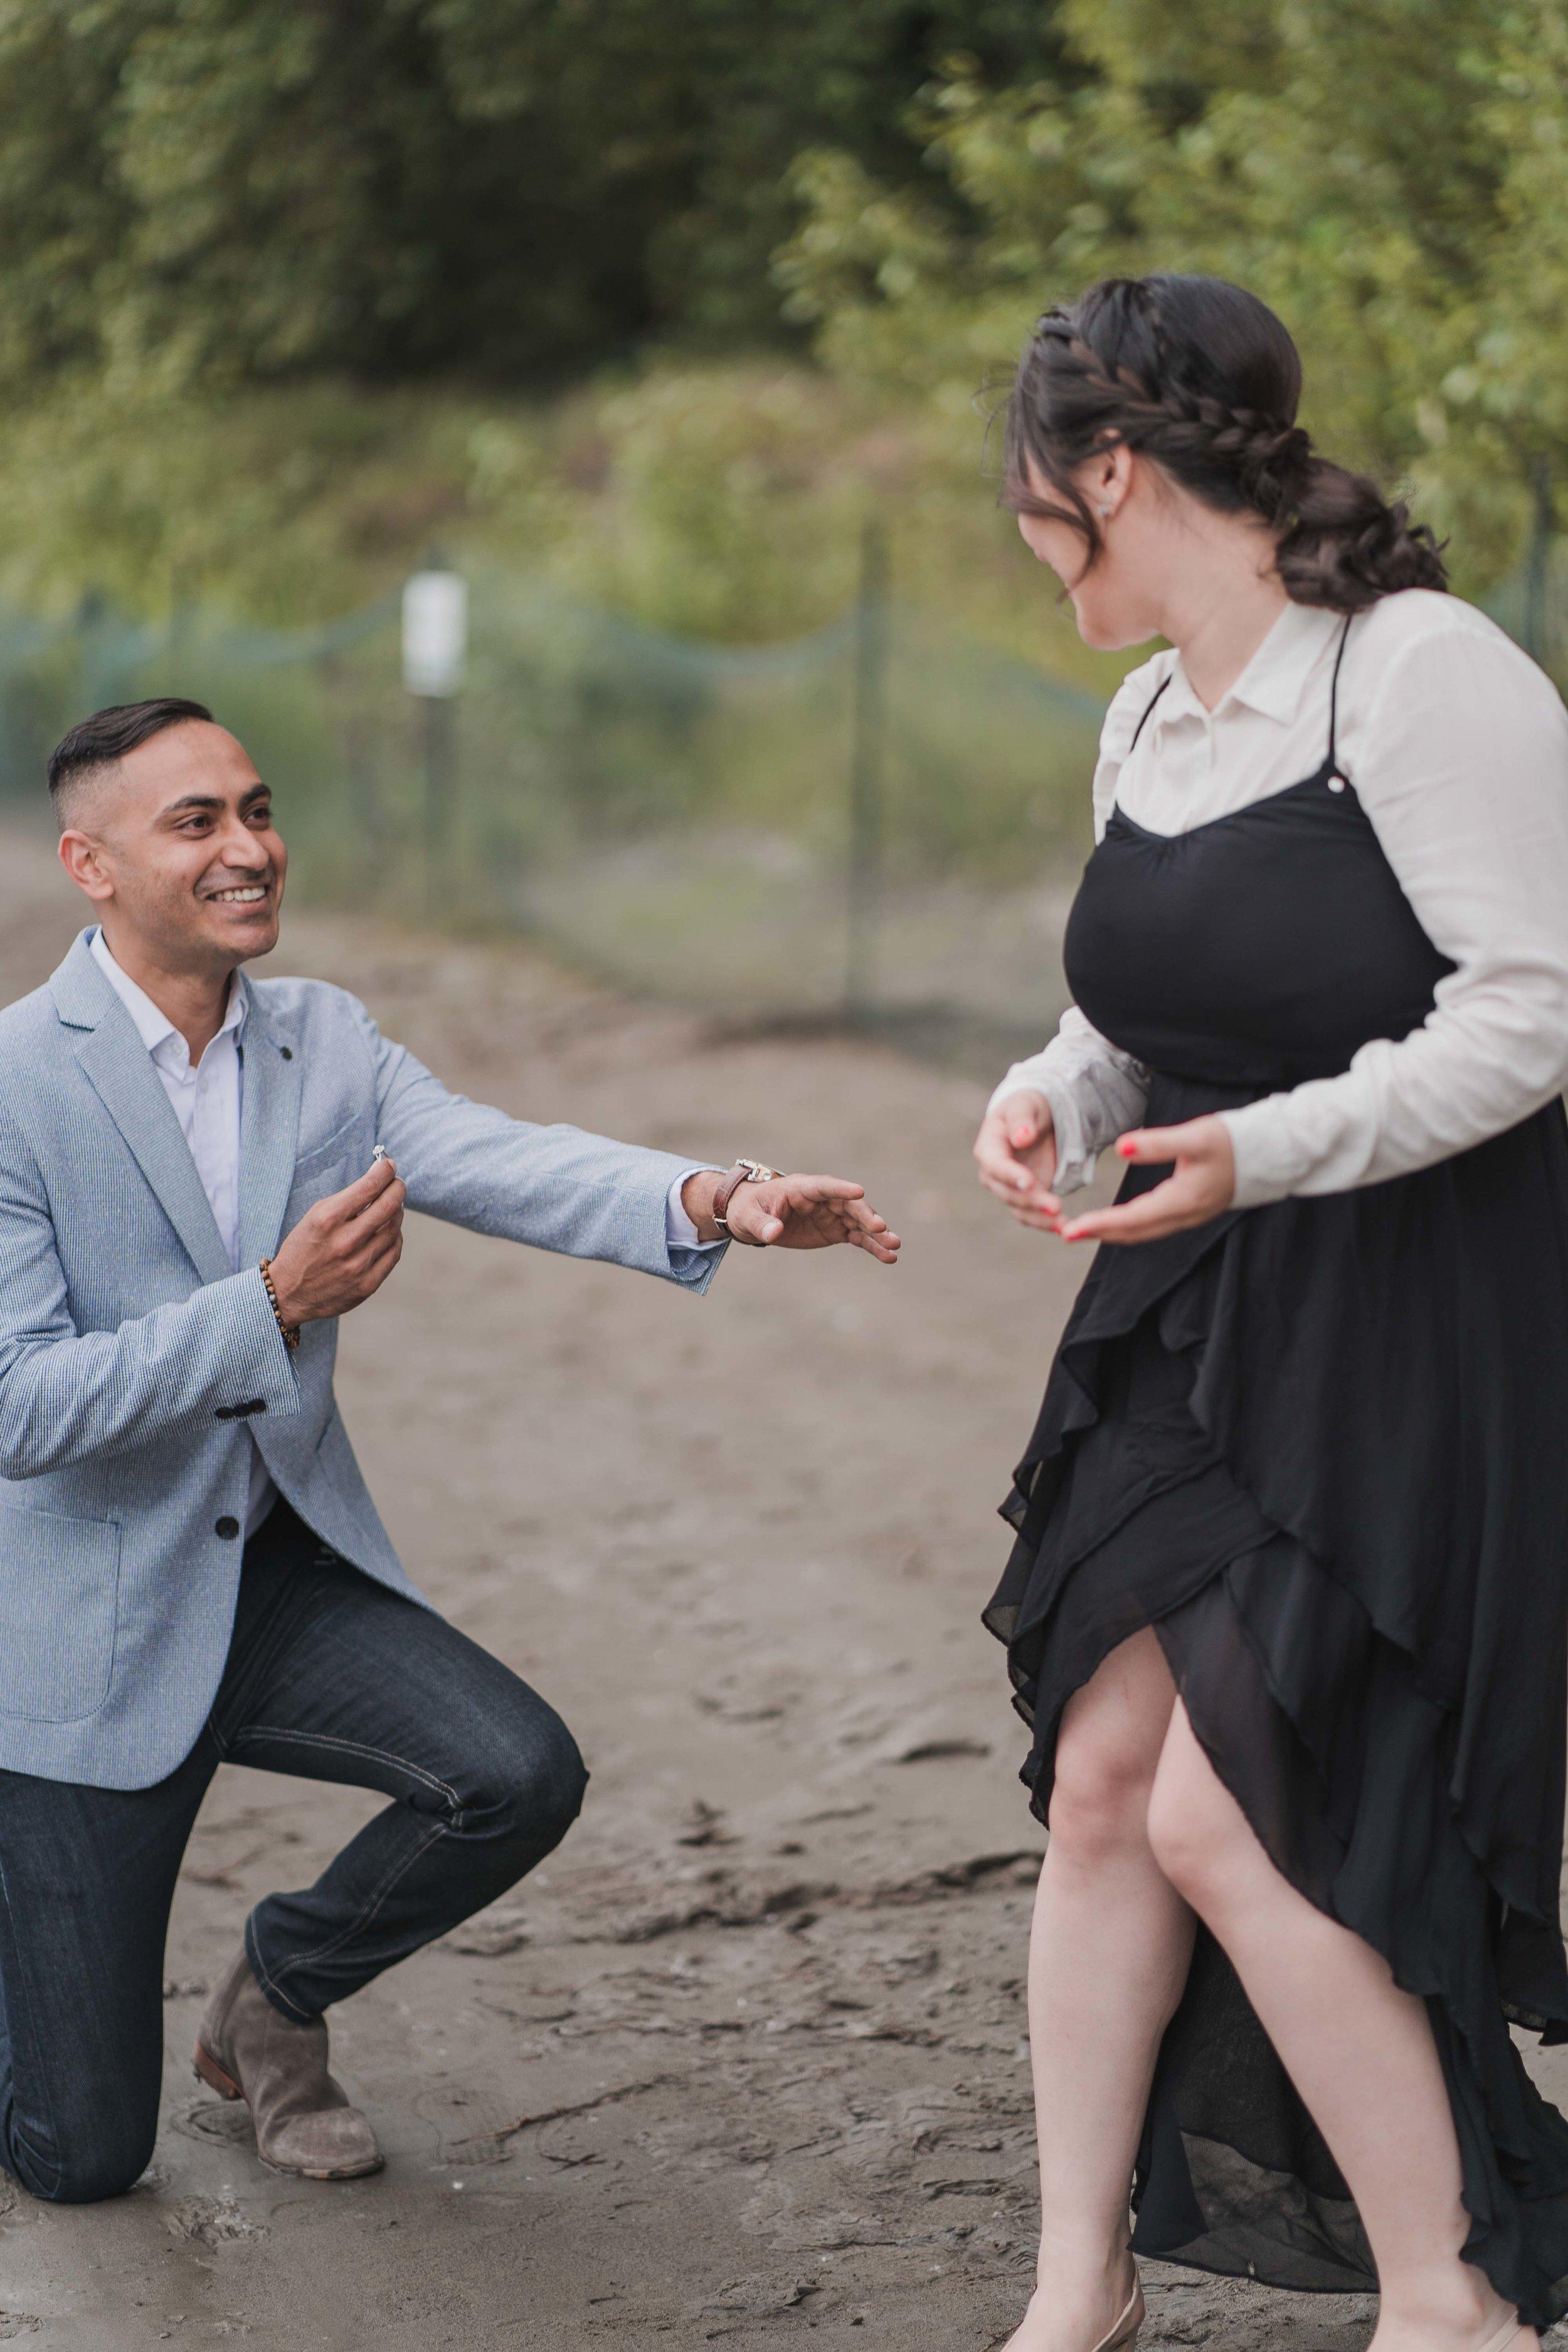 20190622 - Monika & Johnson Engagement - 0134.jpg